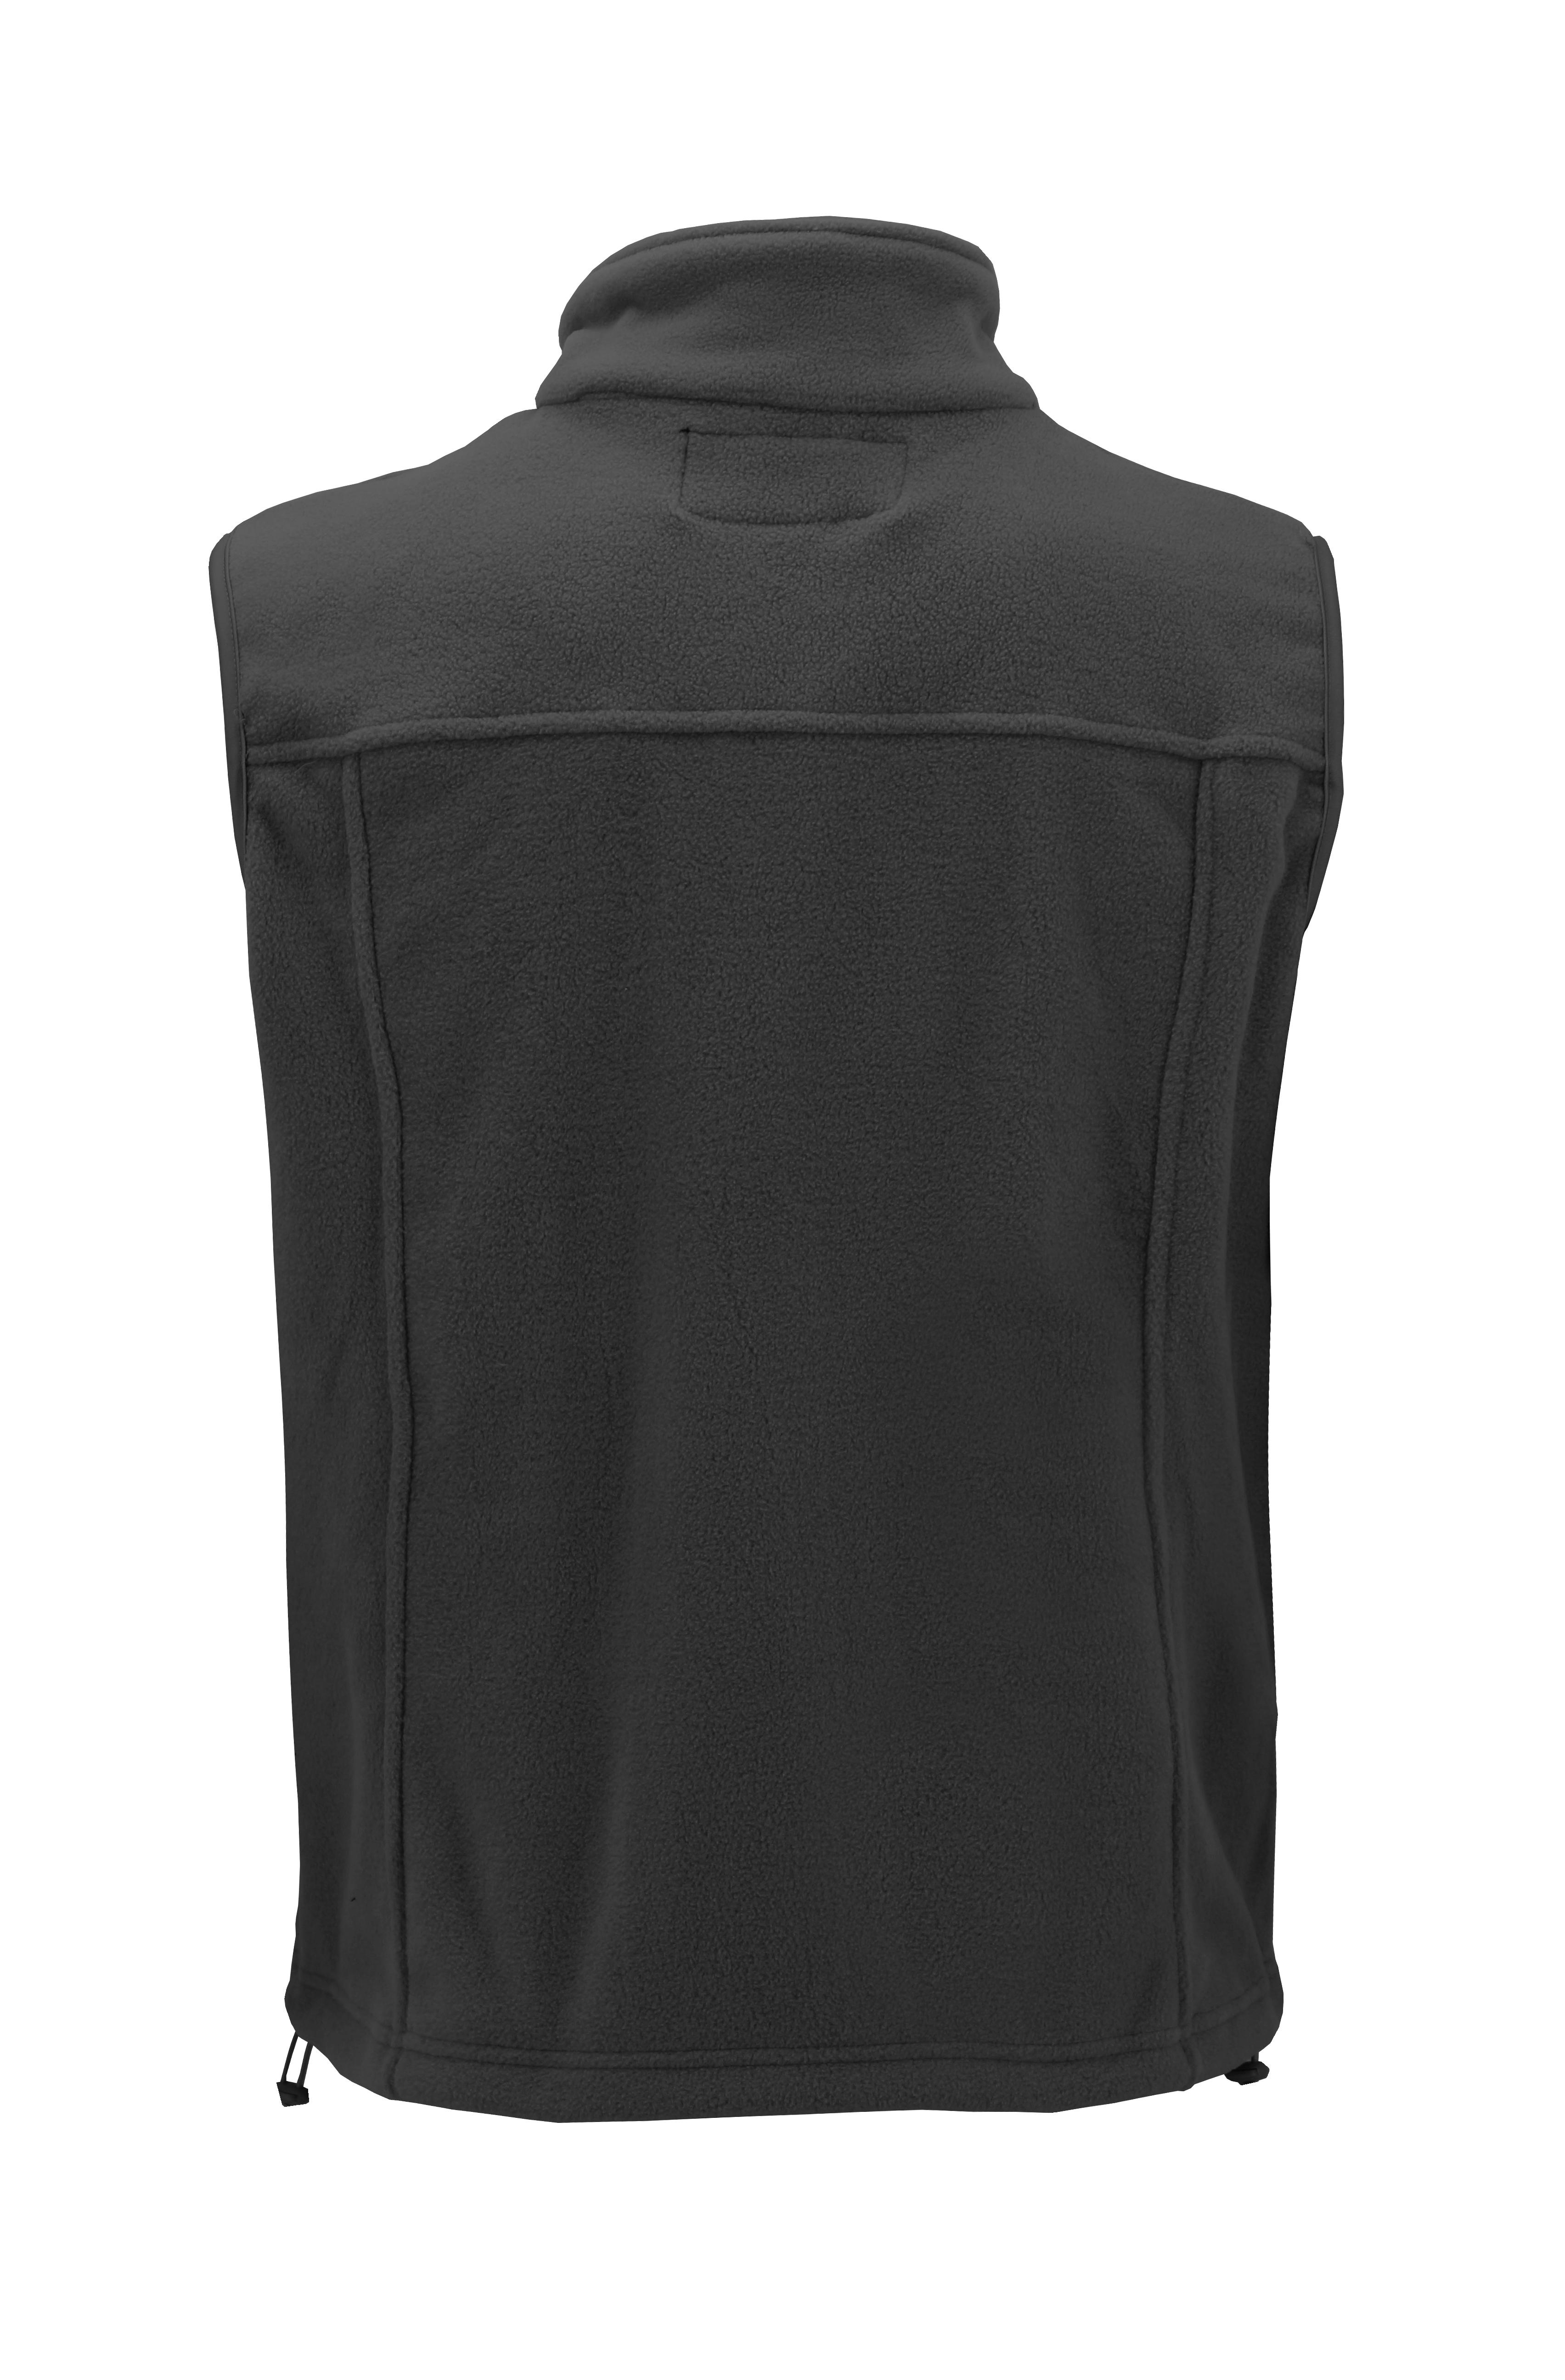 miniature 6 - Men-039-s-Polar-Fleece-Lightweight-Warm-Jacket-Collared-Full-Zip-Up-Sweater-Vest